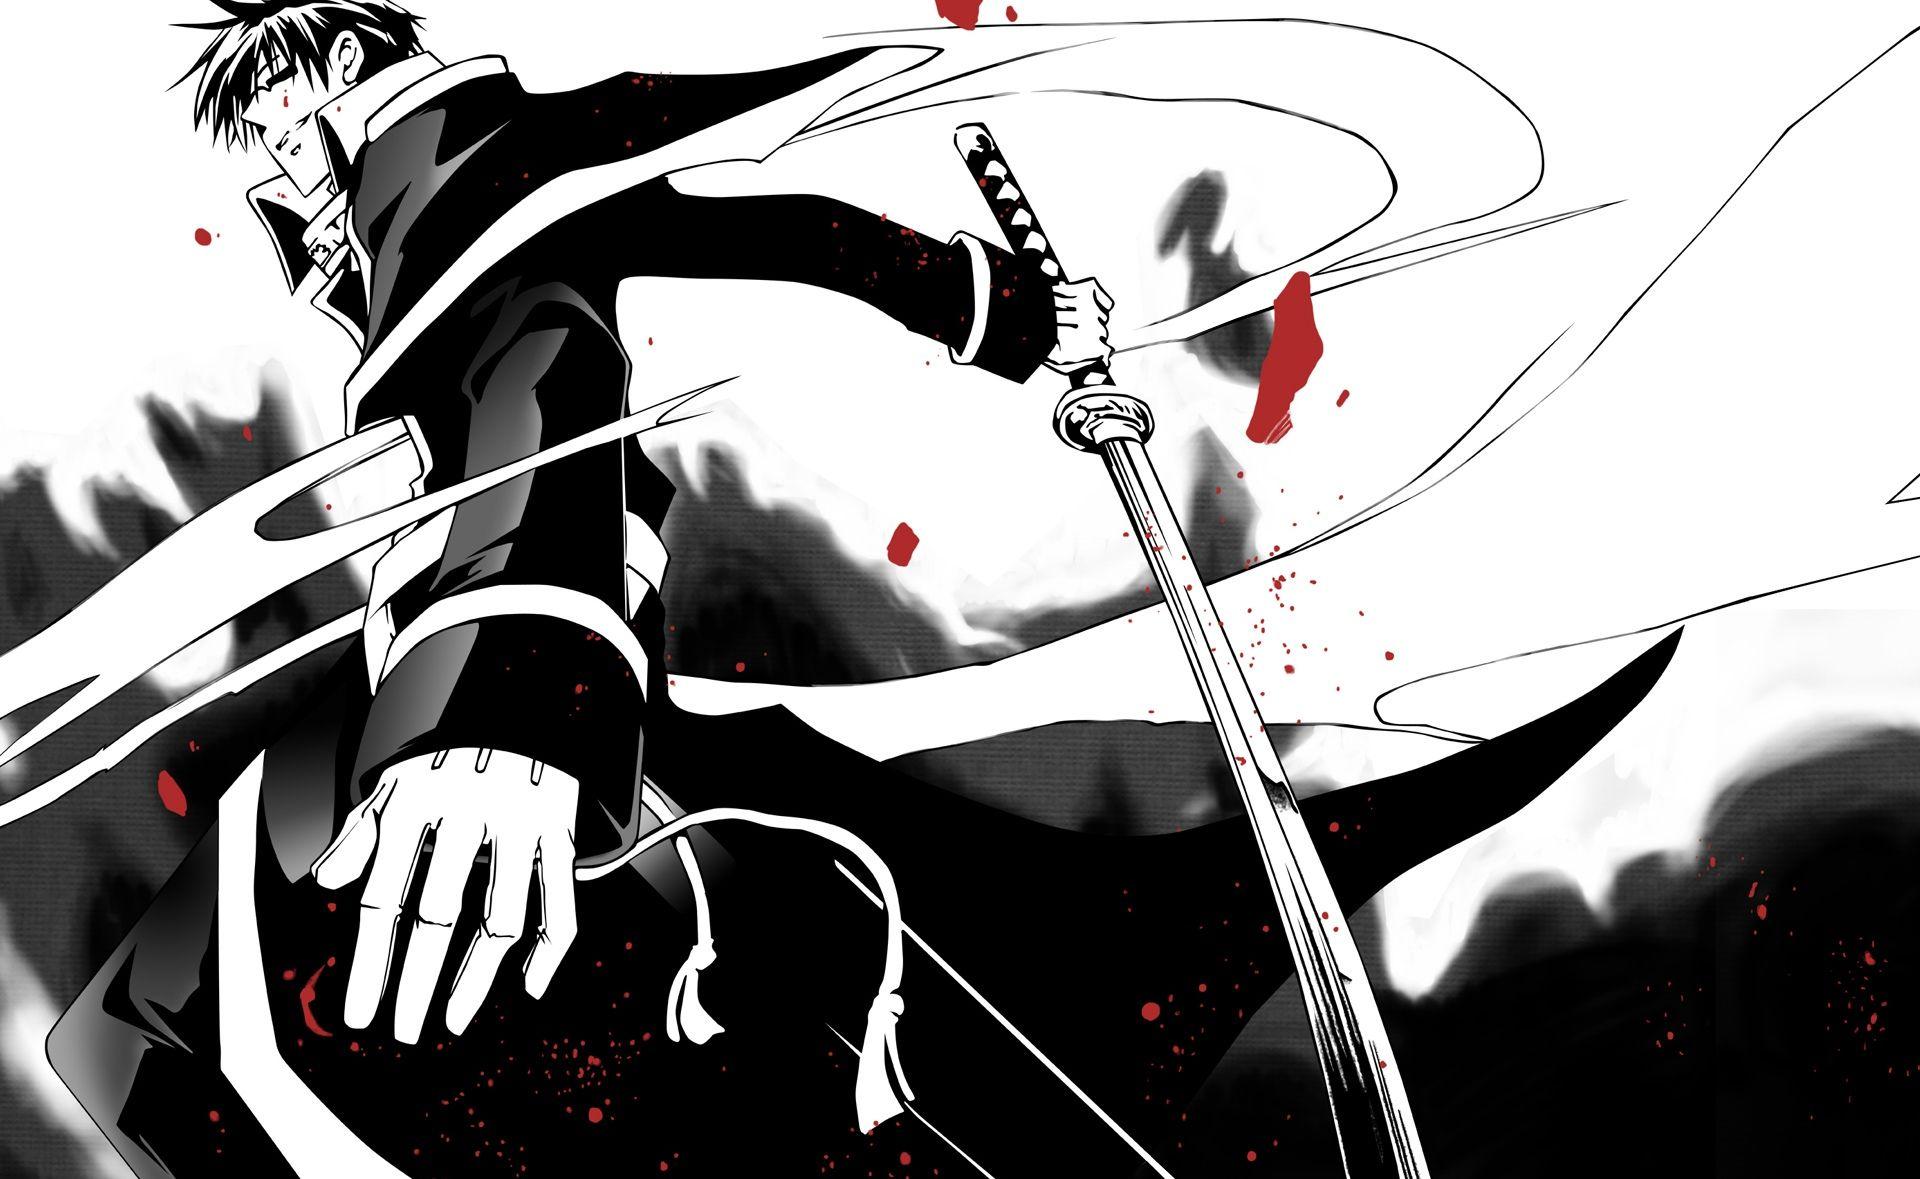 Hd wallpaper anime - Anime Hd Wallpaper Download 1920 1200 Free Anime Hd Wallpapers 28 Wallpapers